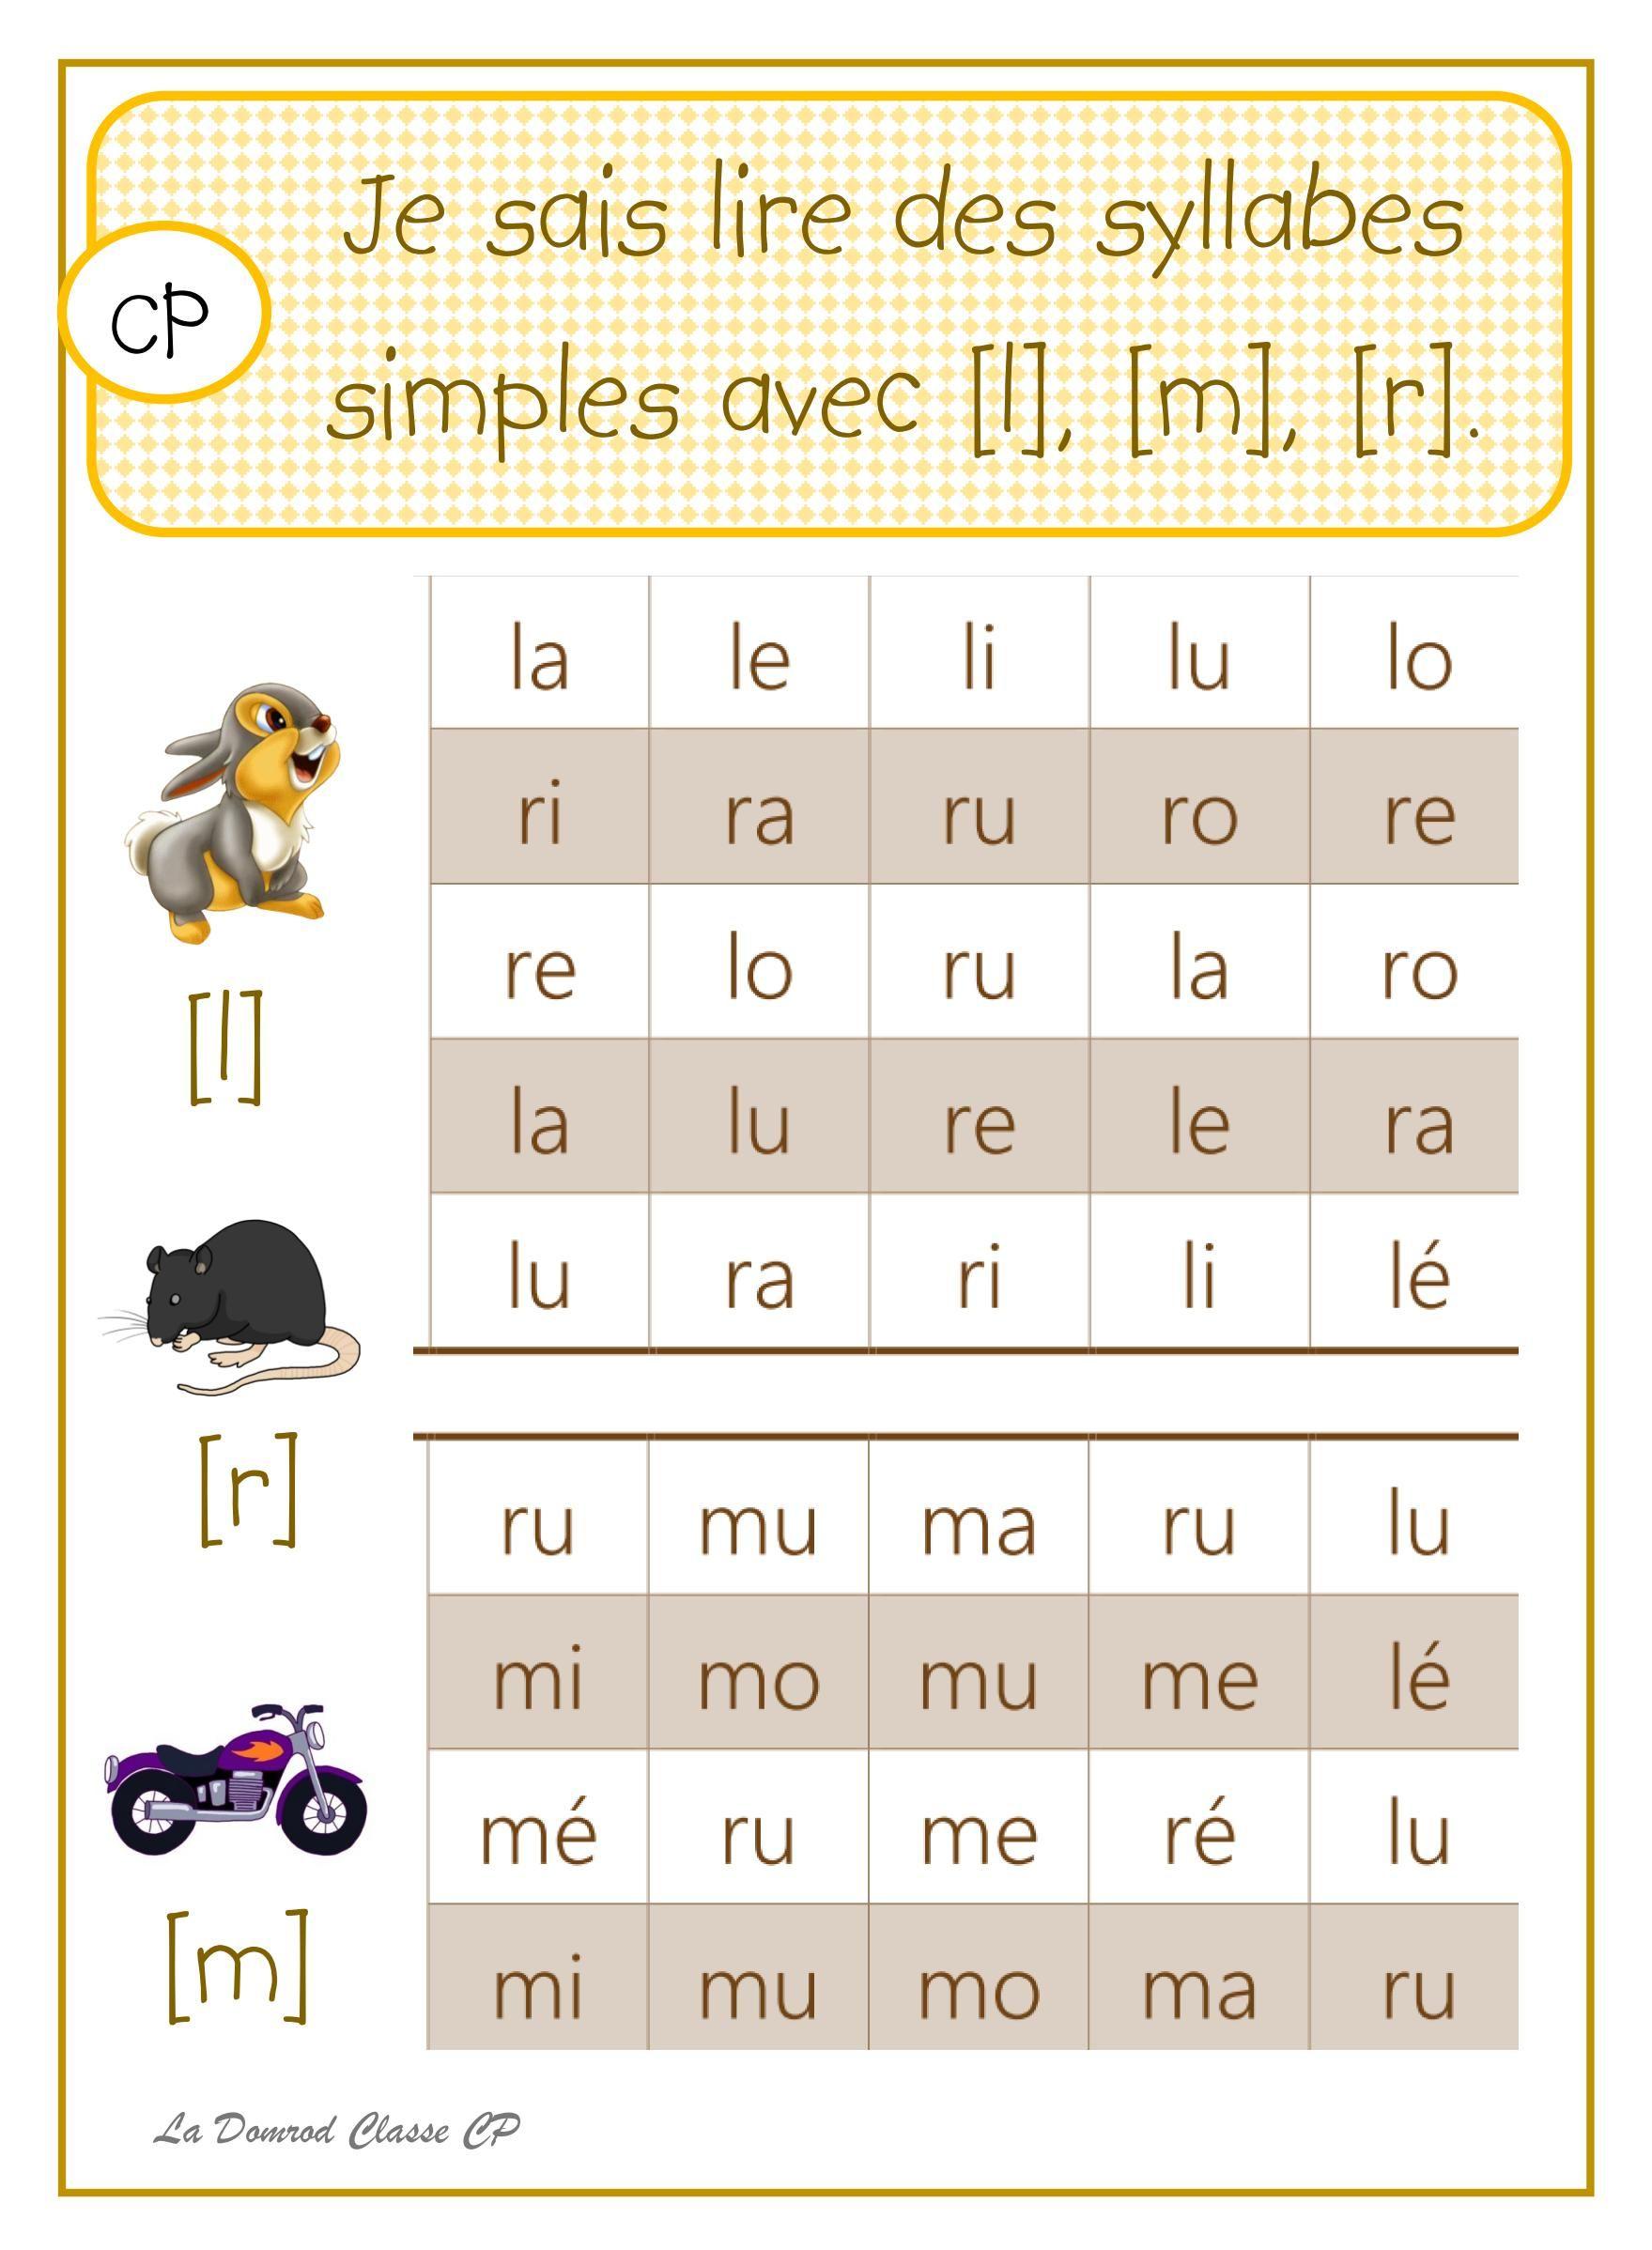 Lire Des Syllabes Simples   Education And Literacy, French pour Francais Facile Maternelle